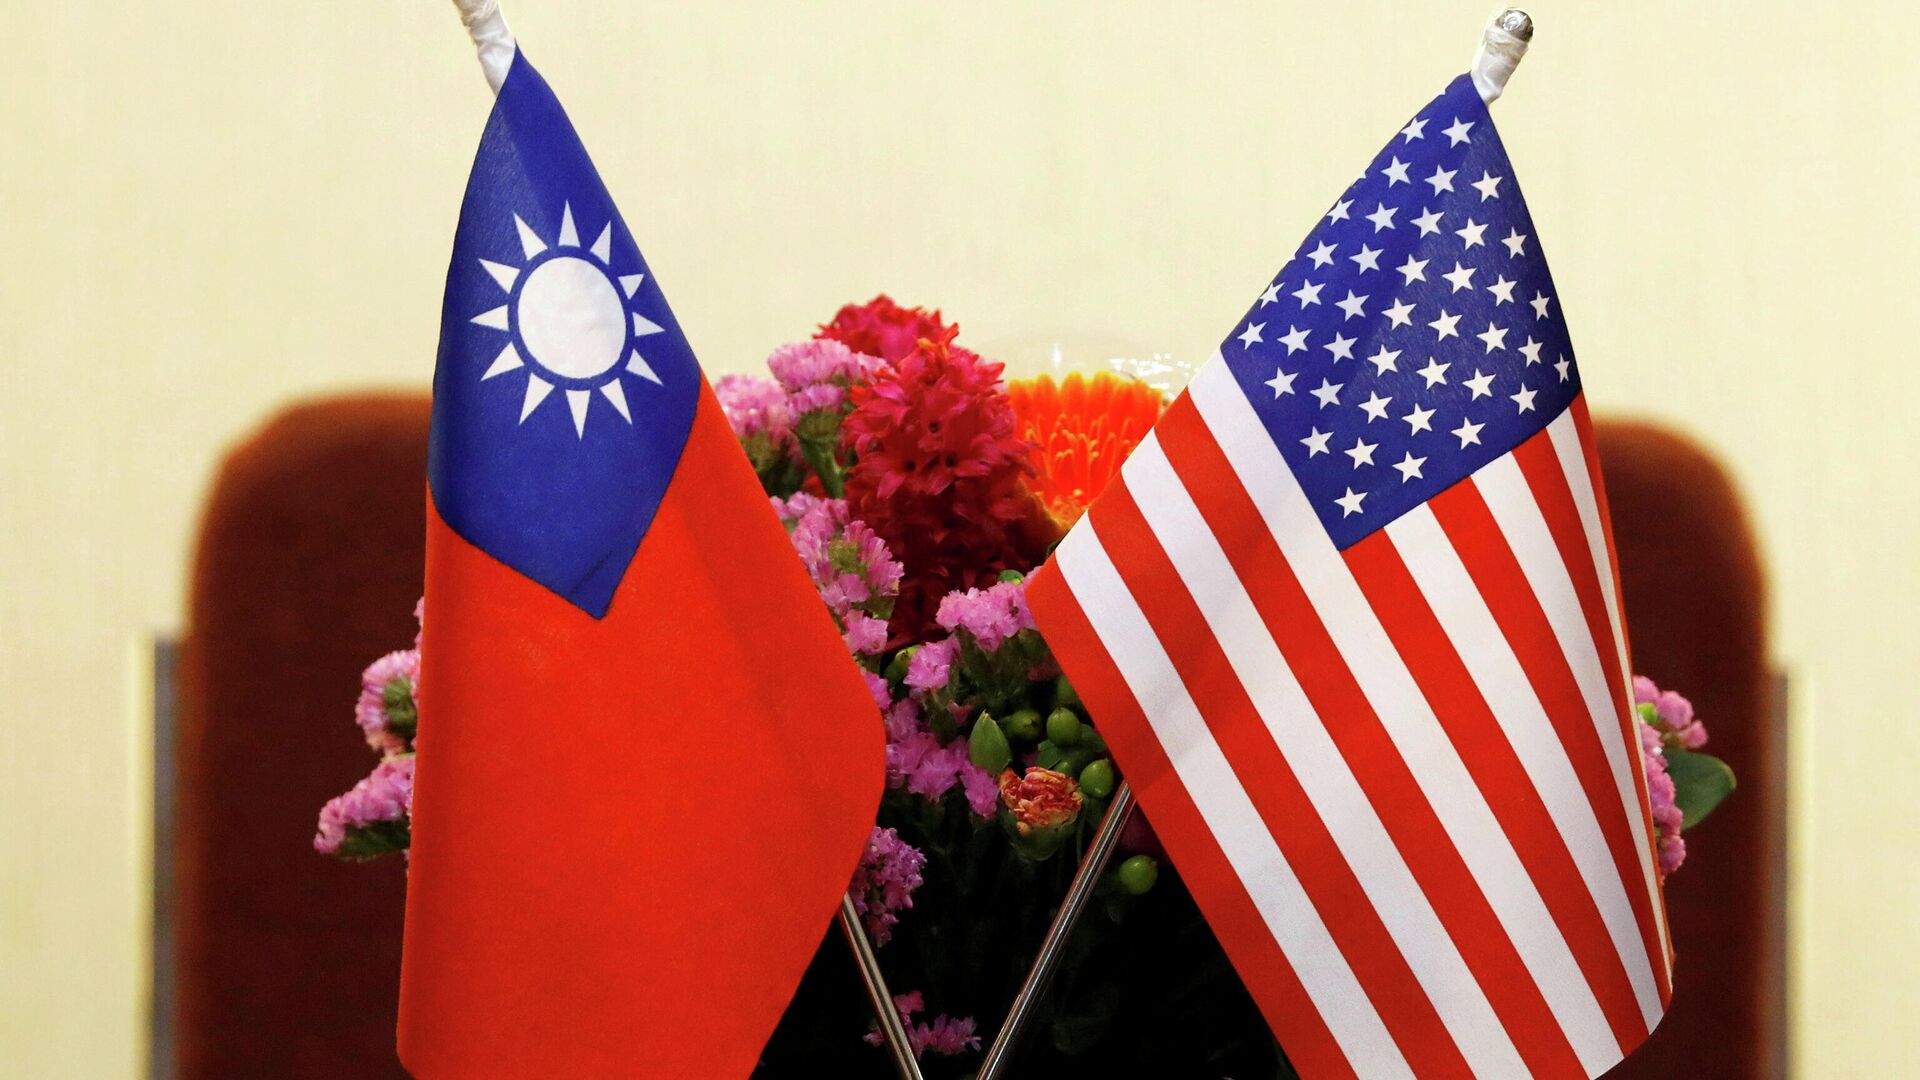 Bandiere di Taiwan e USA - Sputnik Italia, 1920, 08.06.2021